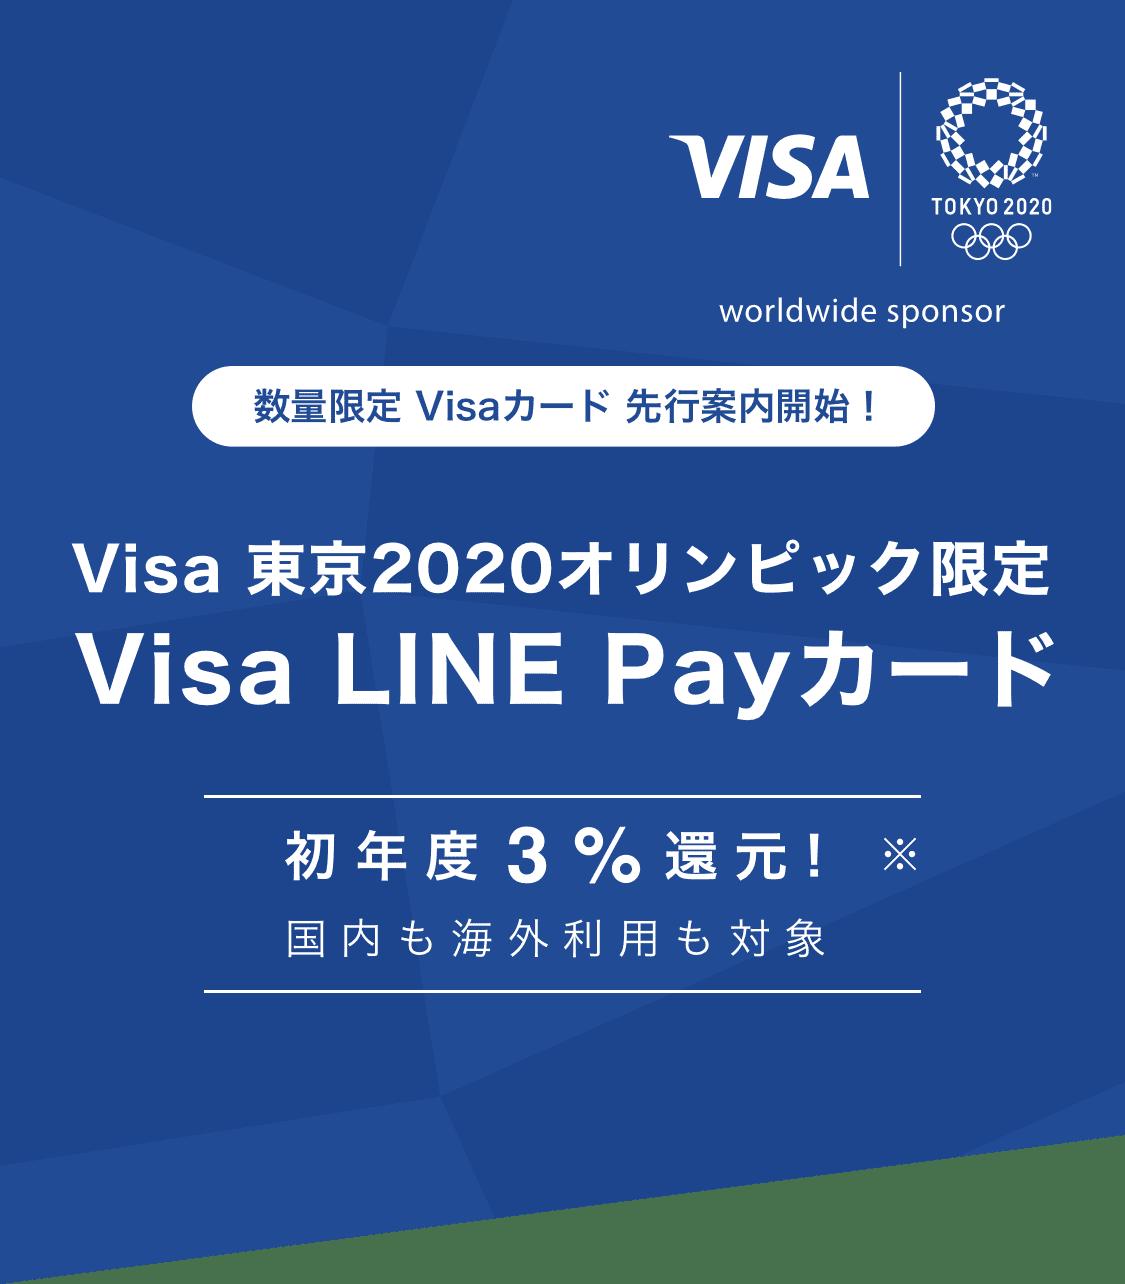 Visa TOKYO 2020 worldwide sponsor 数量限定 Visaカード 先行案内開始! Visa 東京2020オリンピック限定 Visa LINE Payカード 初年度3%還元!※ 国内も海外利用も対象